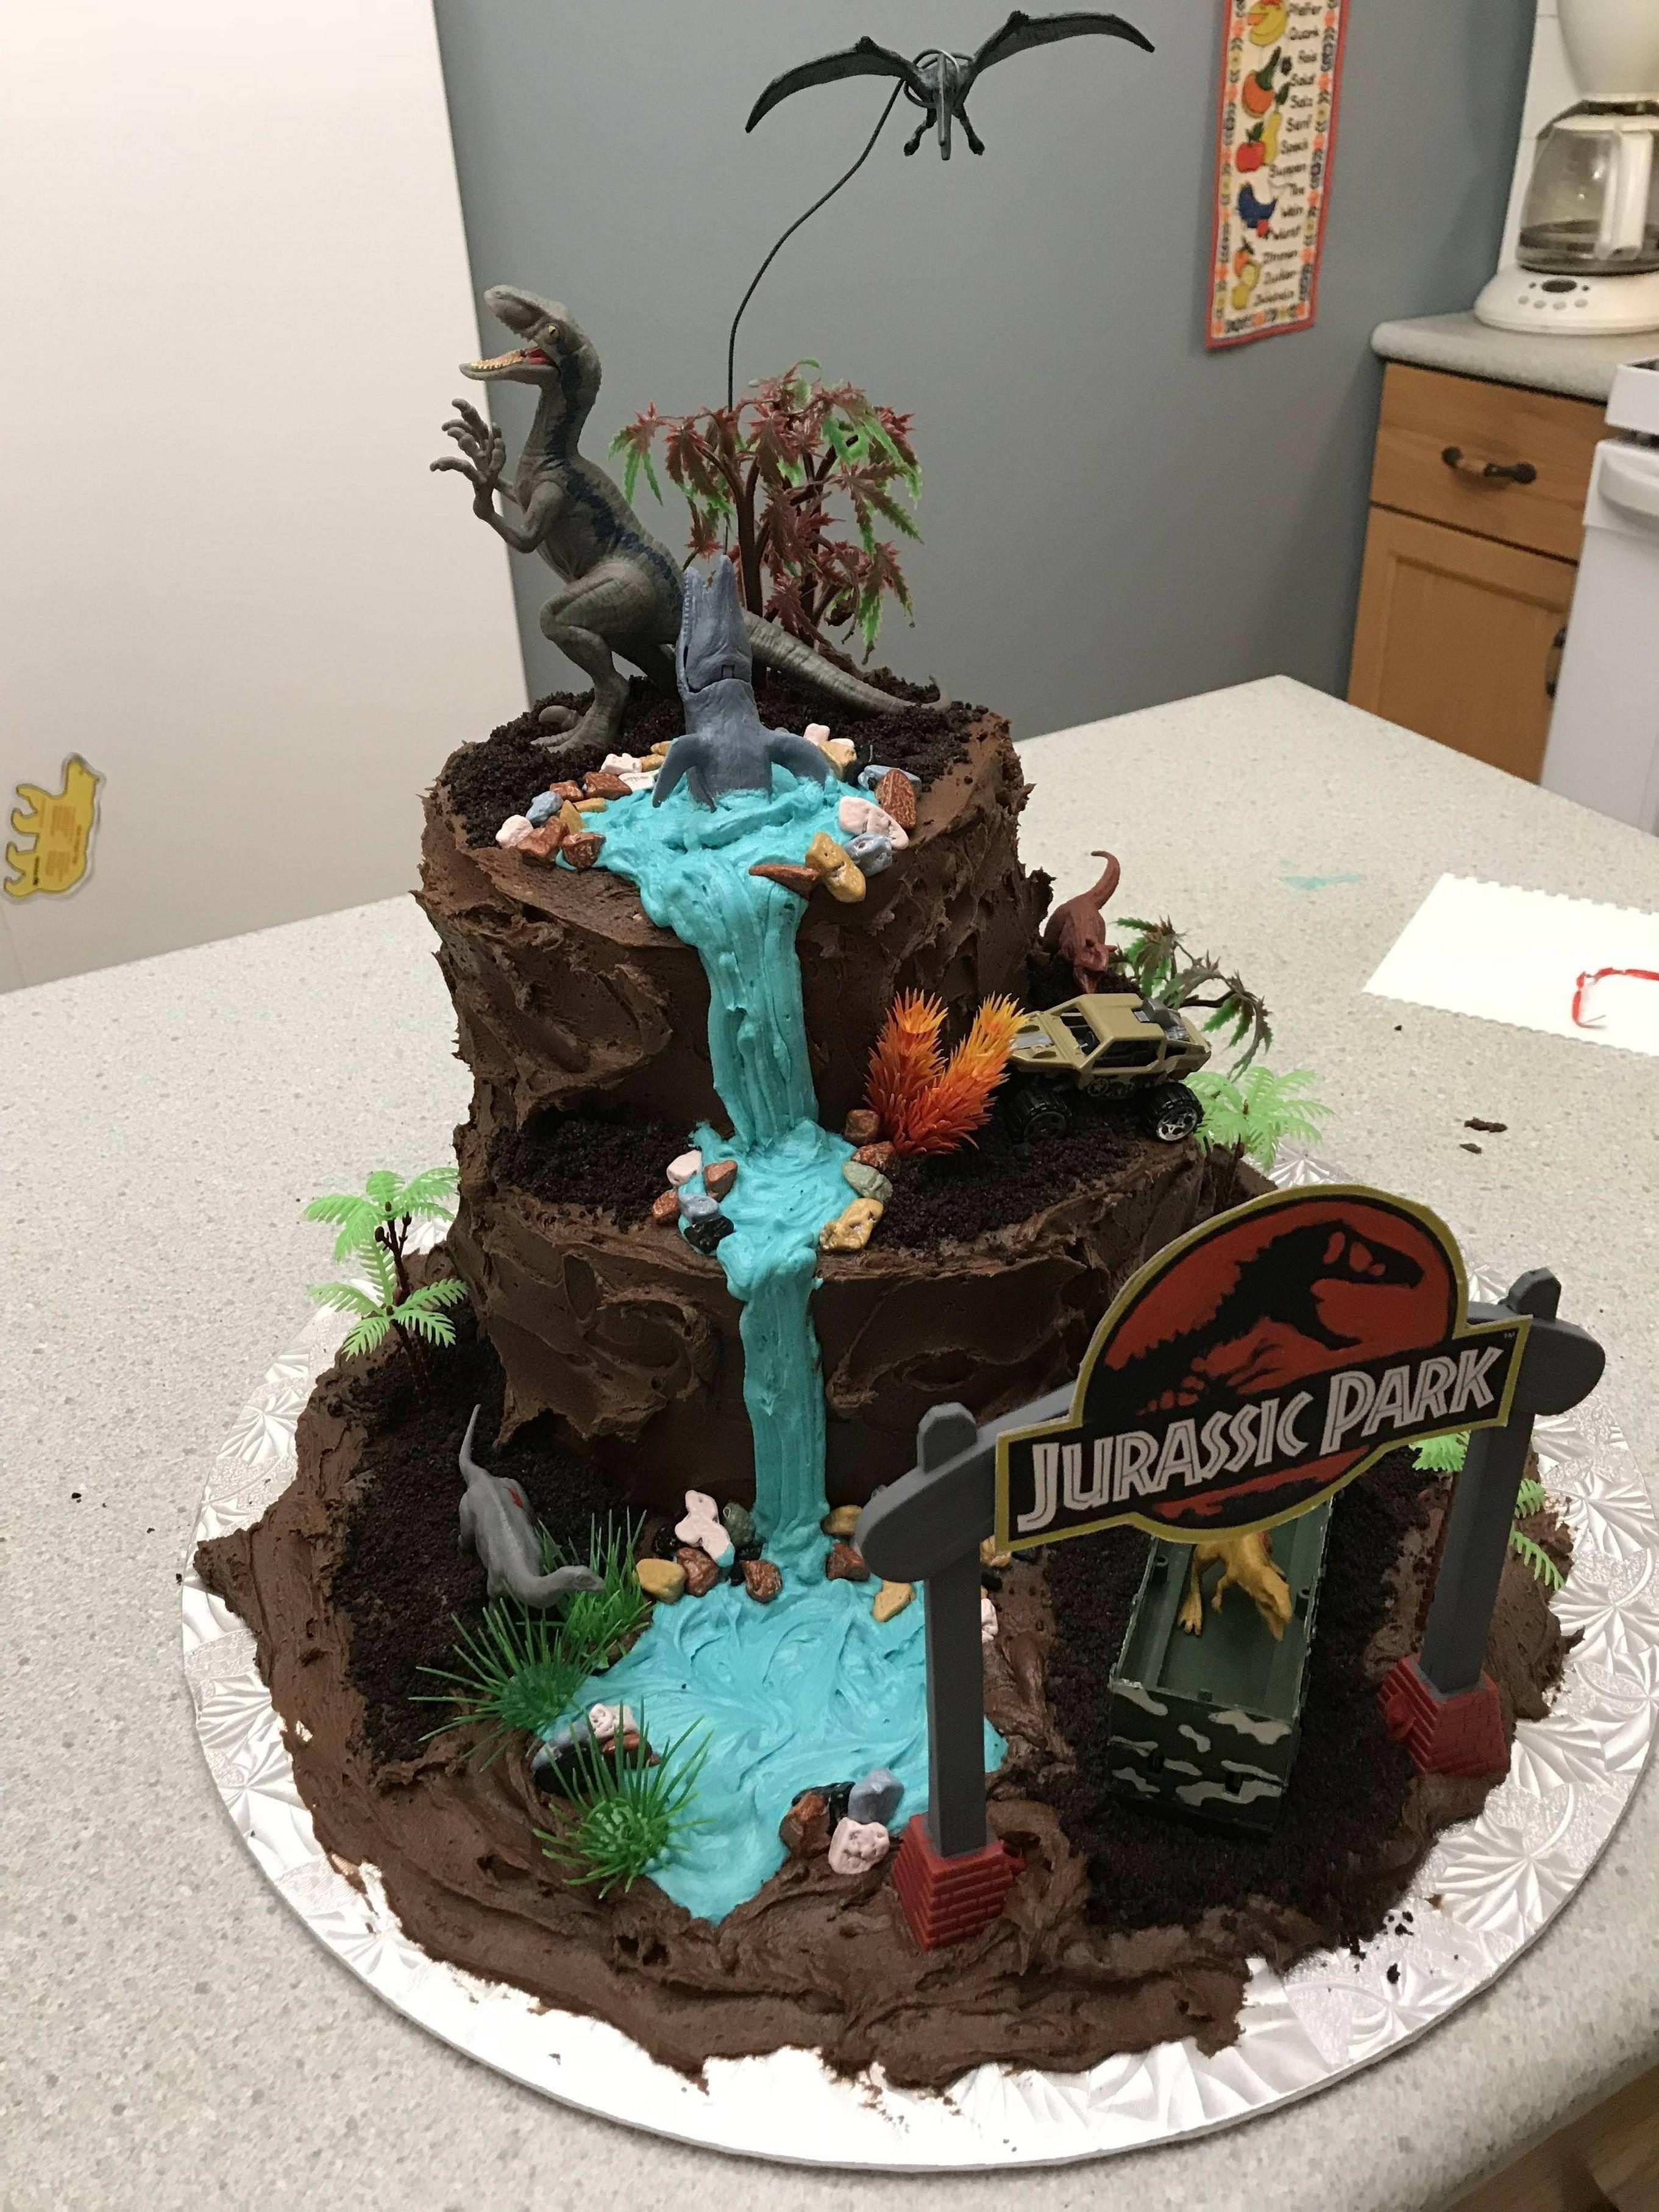 Jurassic Park Birthday Cake Jurassic Park Birthday Cake Album On Imgur #jurassicparkworld